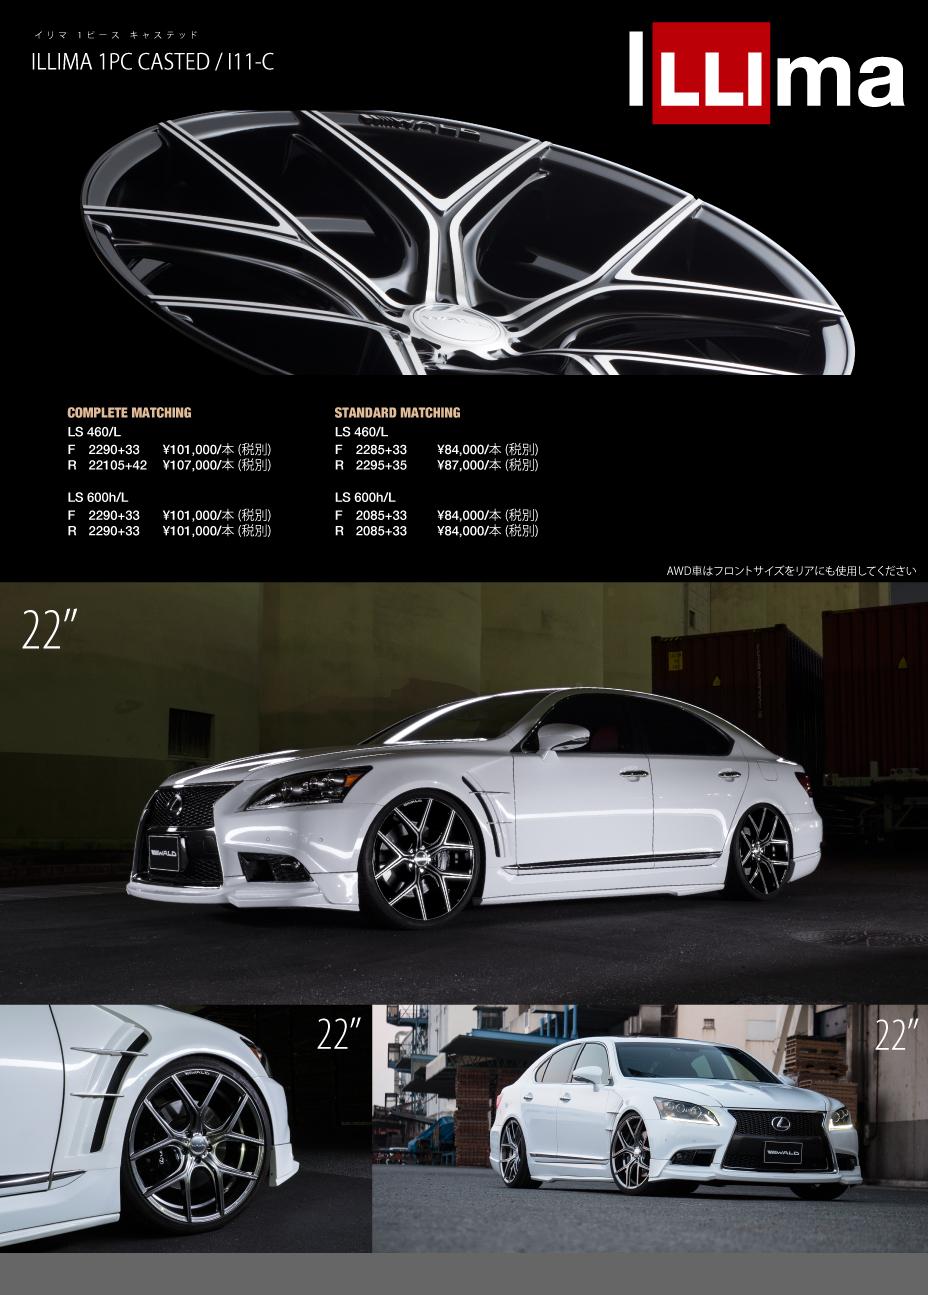 Wheel Lexus Ls 460 600h F Sport Executive Line